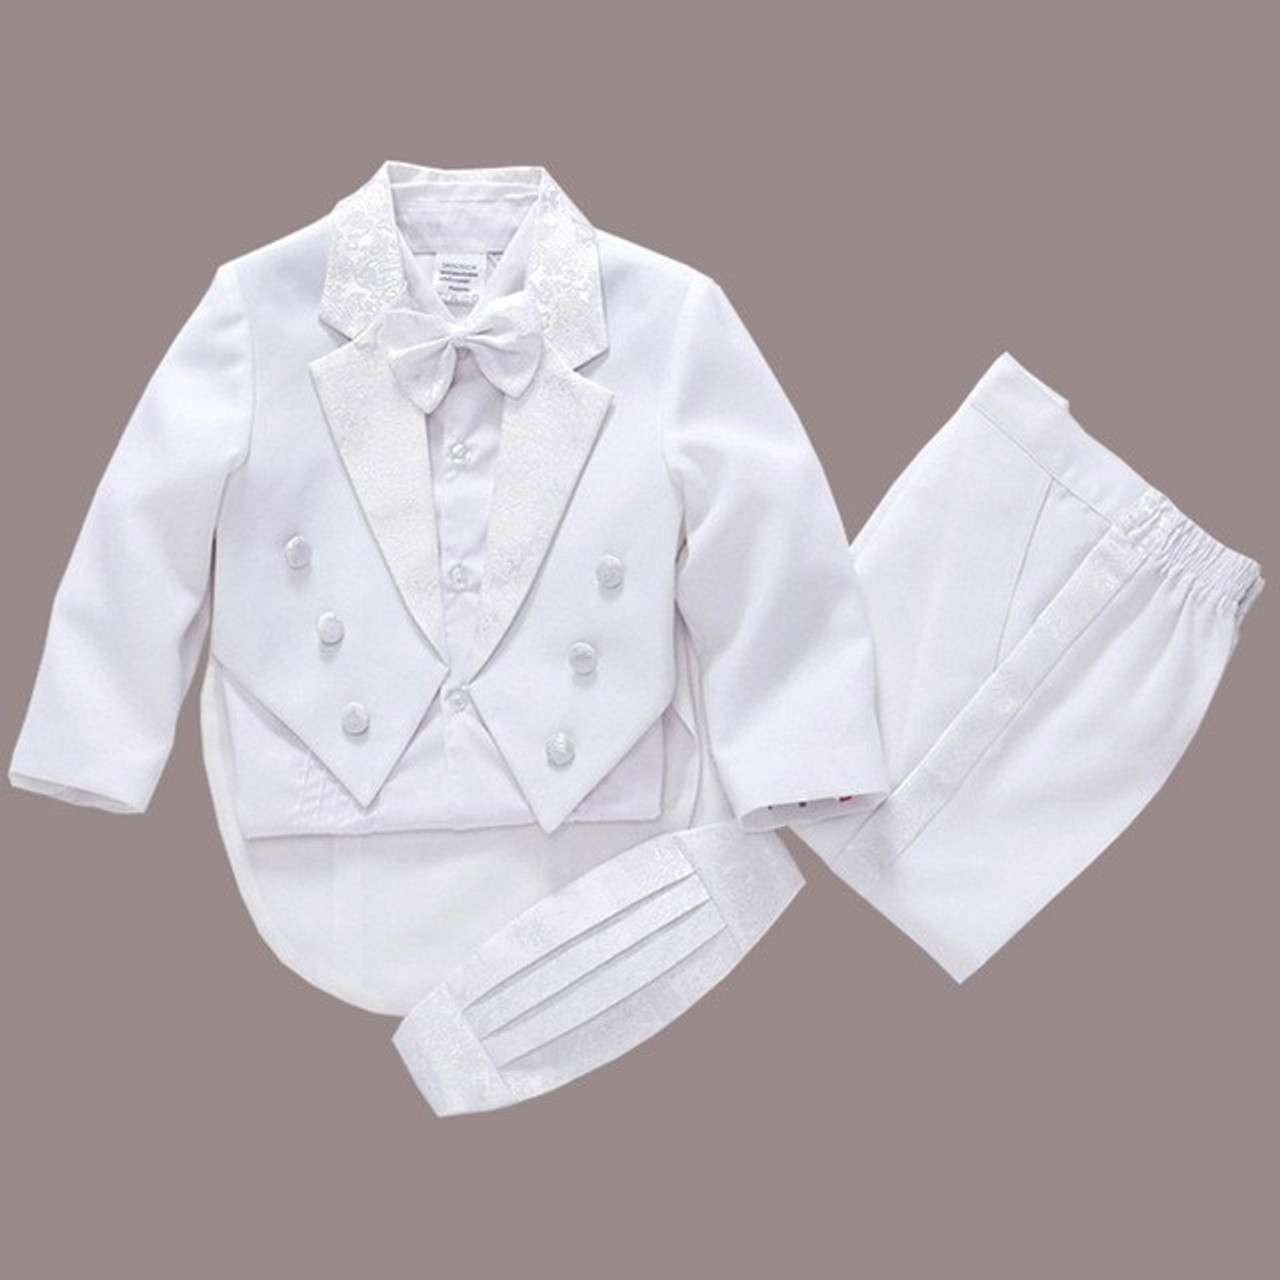 dc8ea3eab0d 2017 new fashion white balck baby boys suit kids blazers boy suit for weddings  prom ...